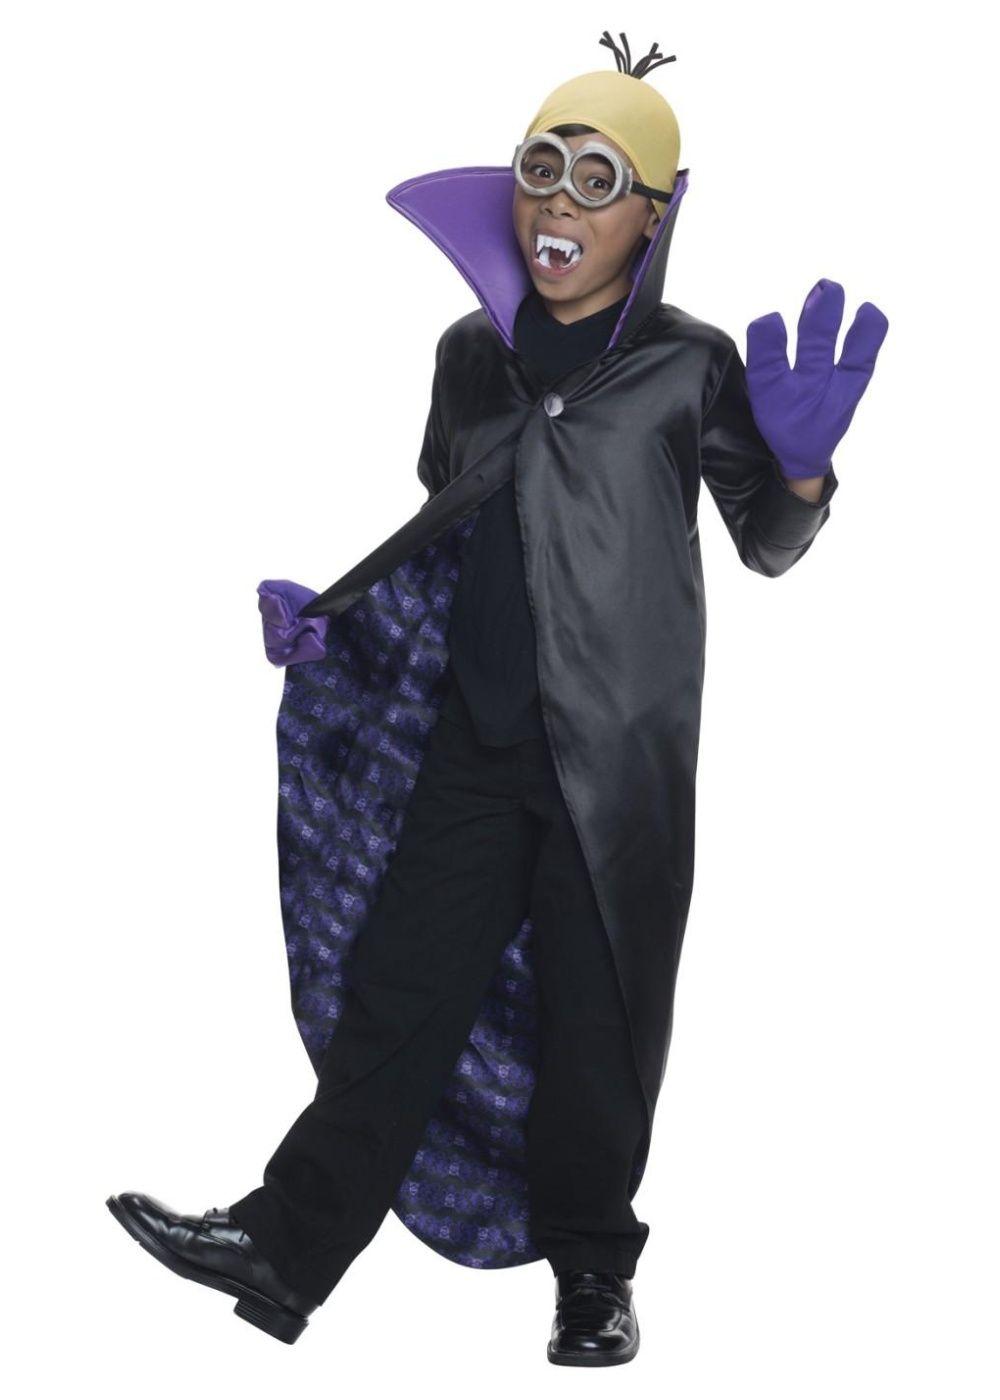 Minions Movie Dracula Boys Costume  sc 1 st  Pinterest & Minions Movie Dracula Boys Costume   2015 Kids Costumes   Pinterest ...